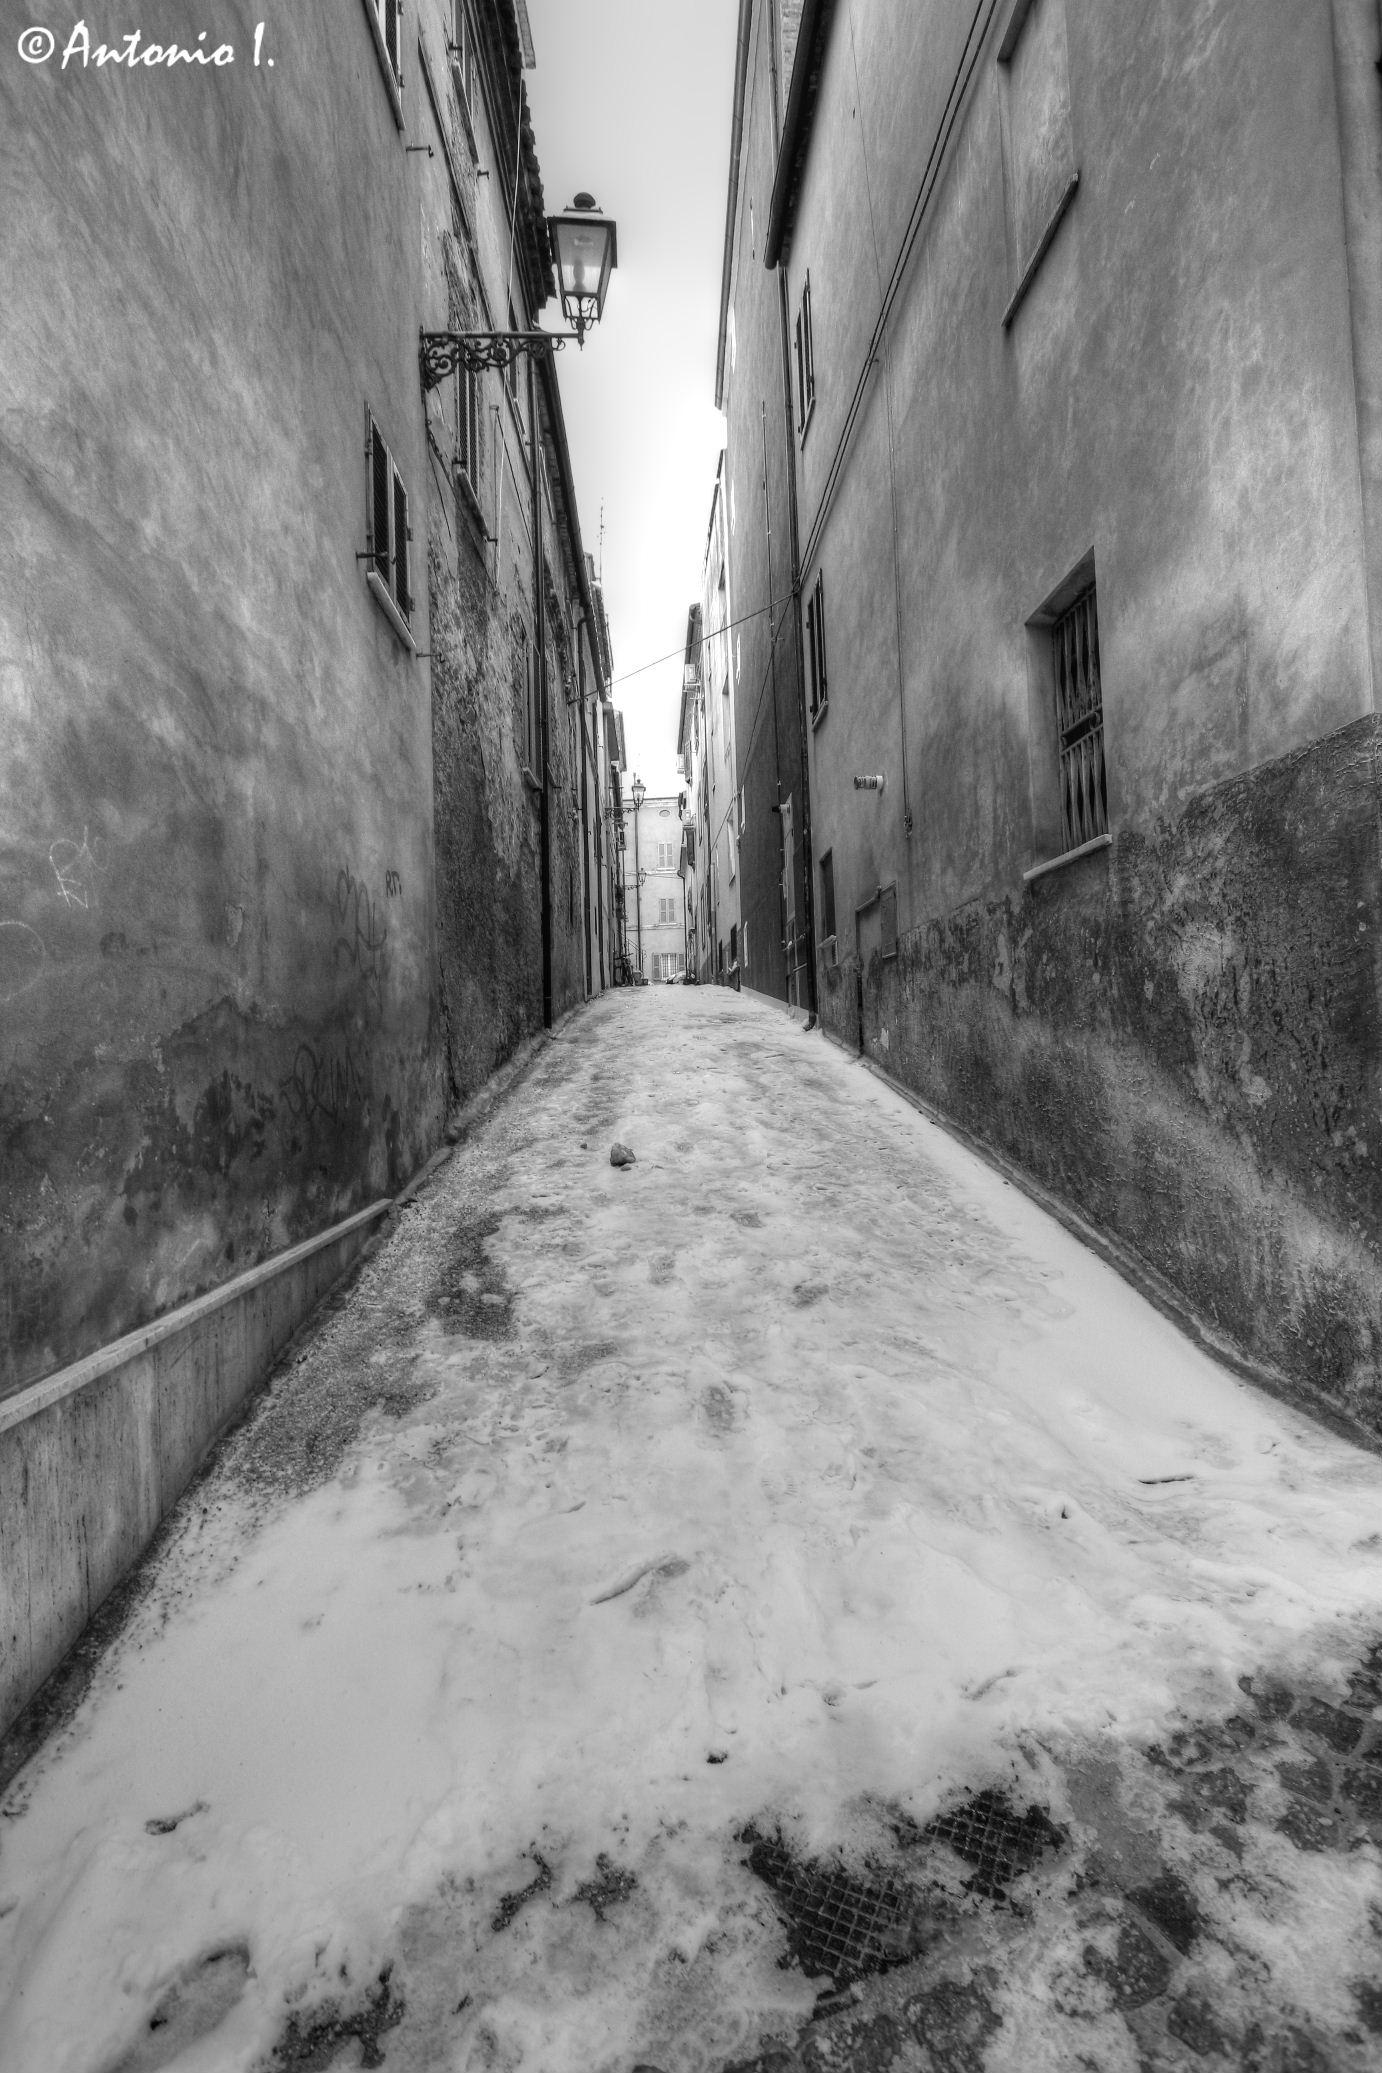 San Benedetto, via Ariosto, 6 febbraio 2012, Antonio I.